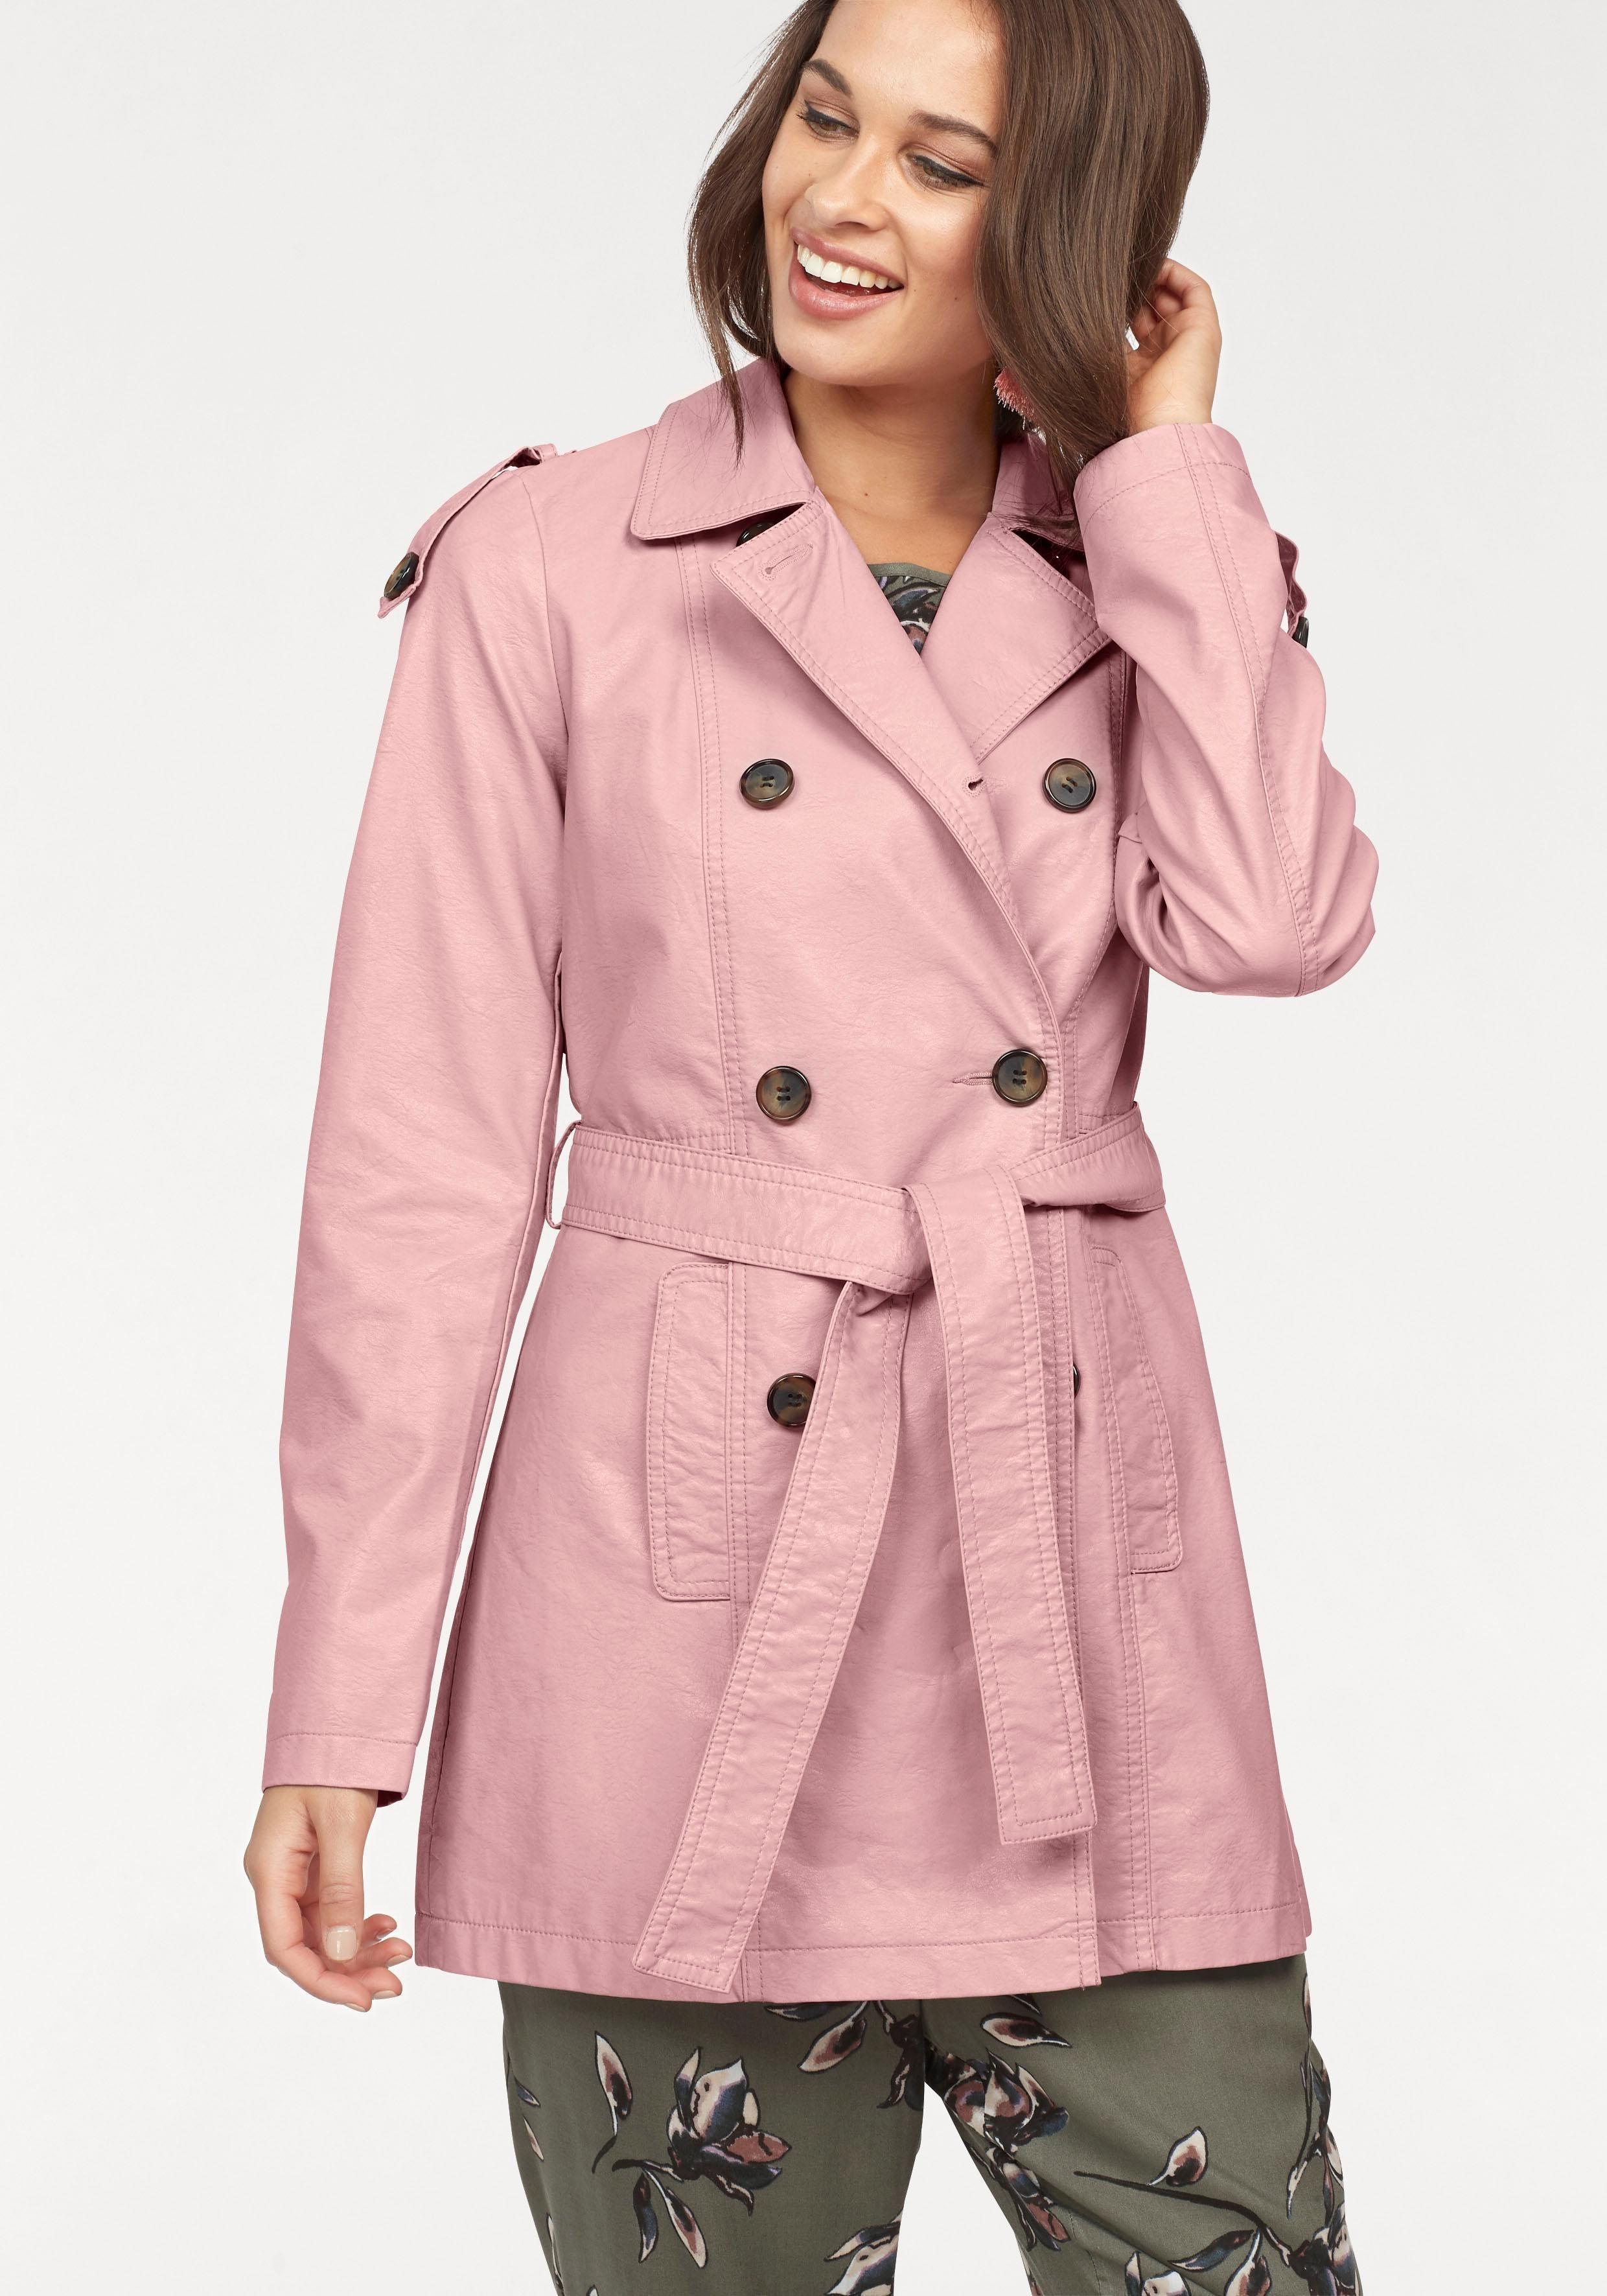 Vero Moda Trenchcoat »CHERRY« aus Lederimitat | Bekleidung > Mäntel > Trenchcoats | Vero Moda